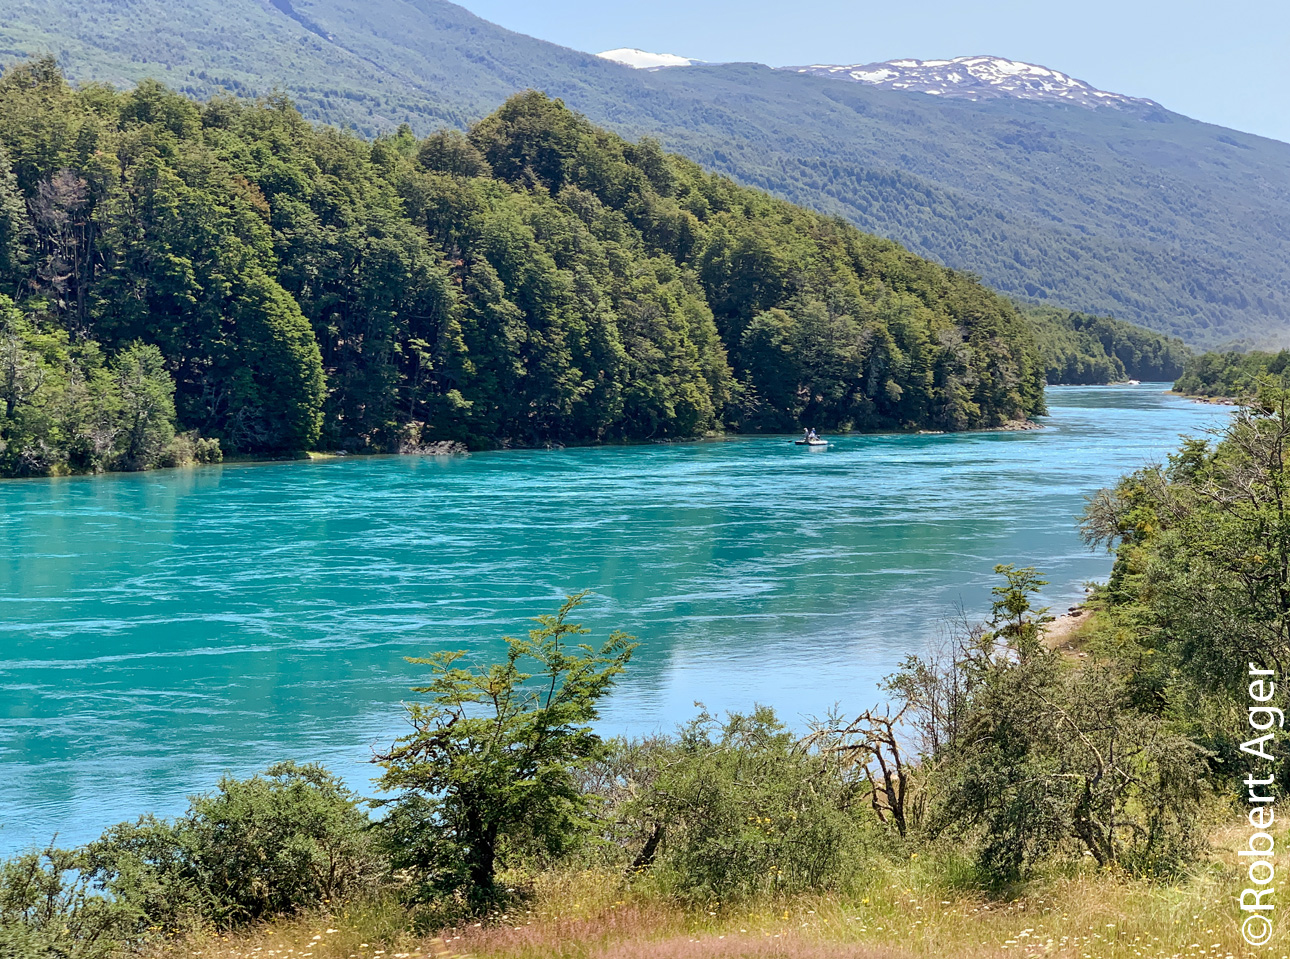 038_Overlander_Gaia_Patagonia